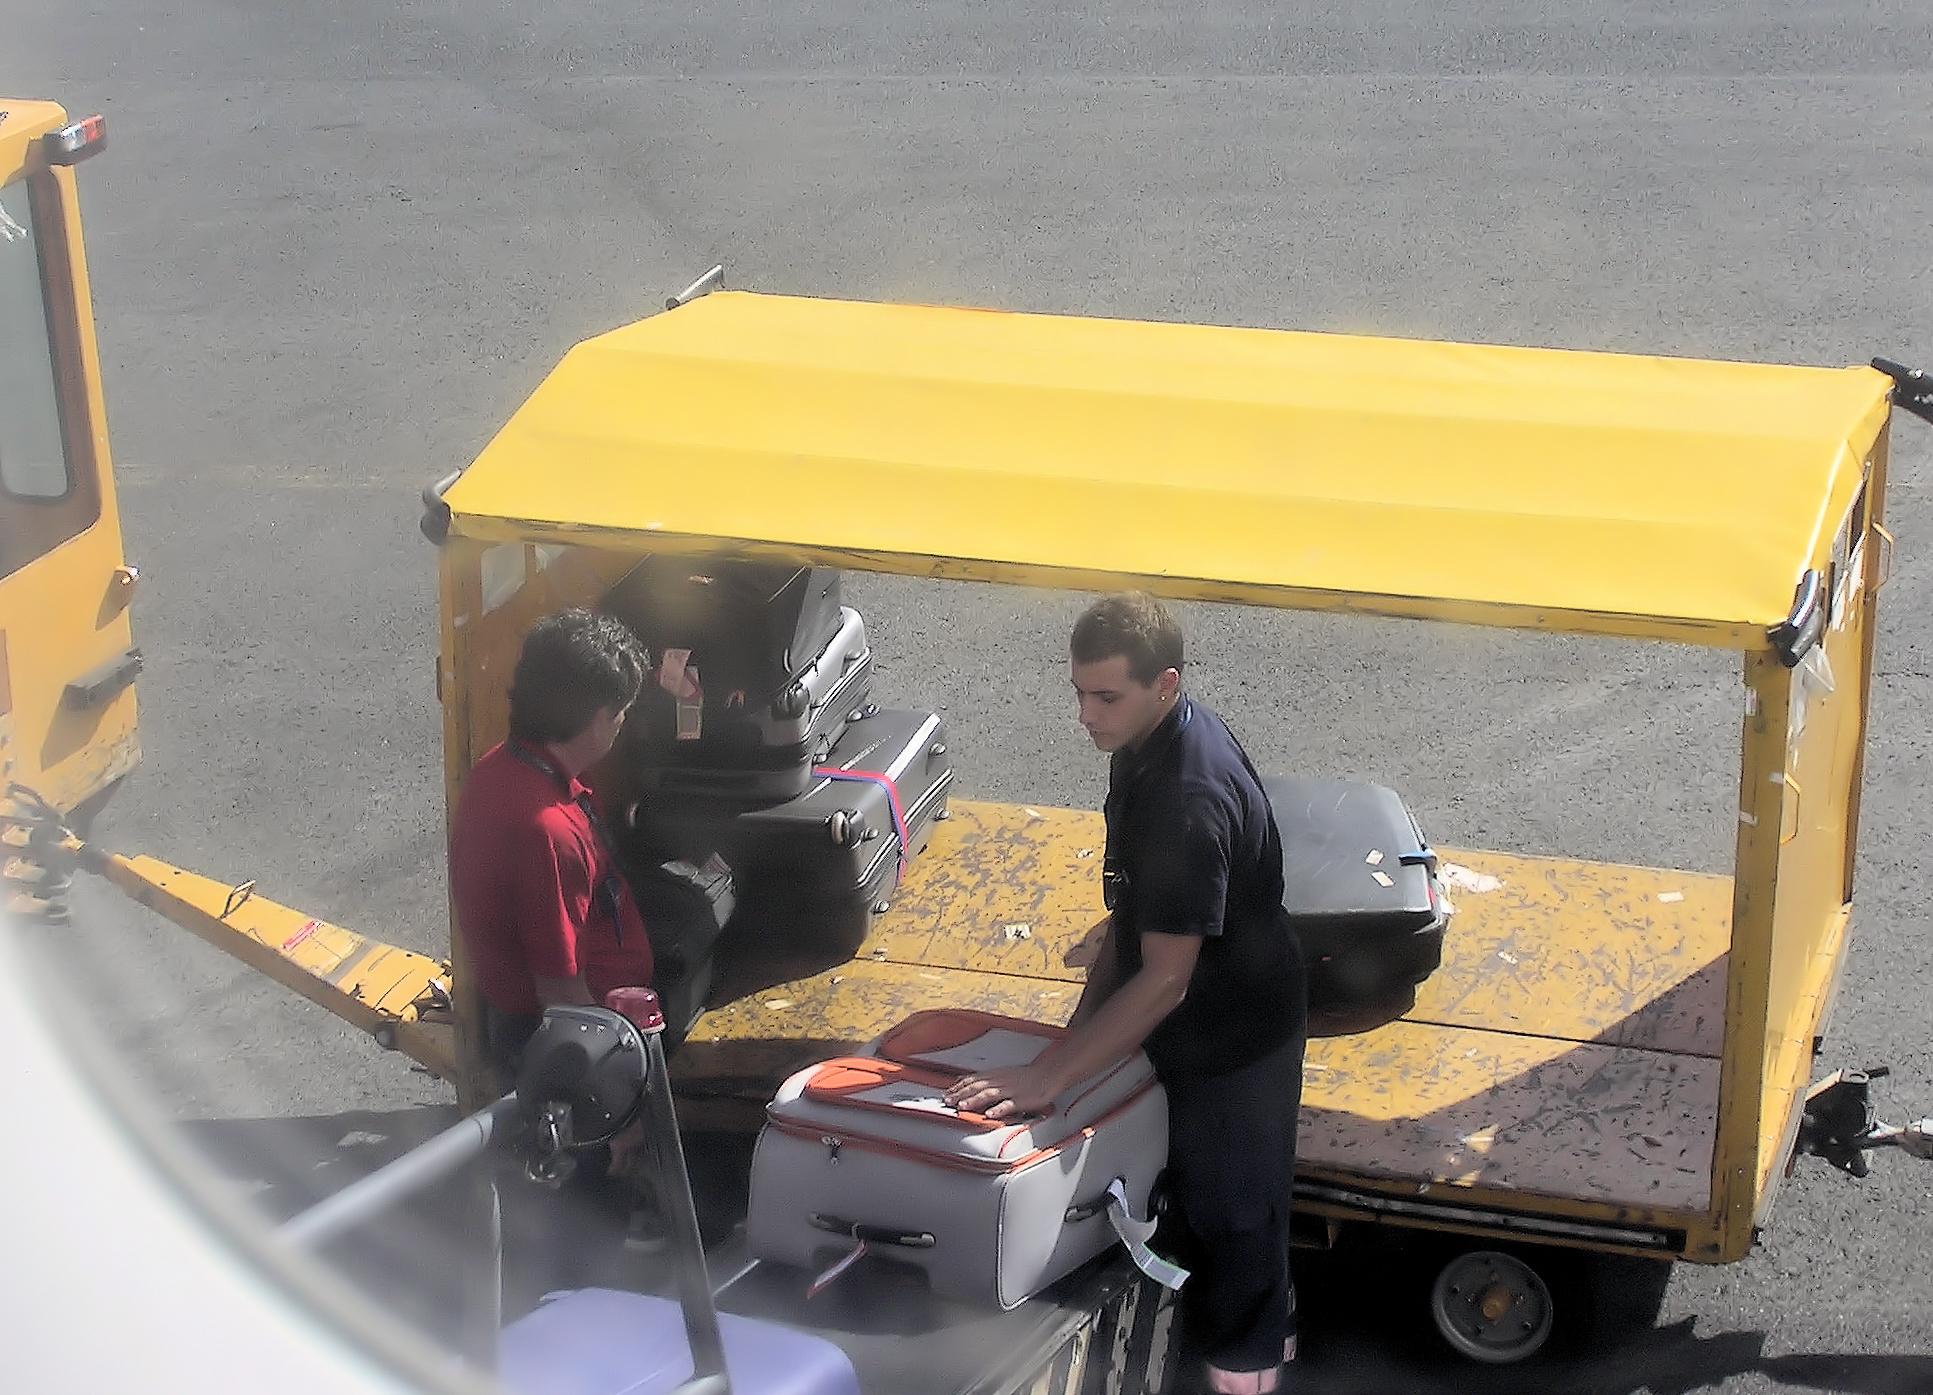 1532ba4b16e5 Baggage handling system - Wikipedia